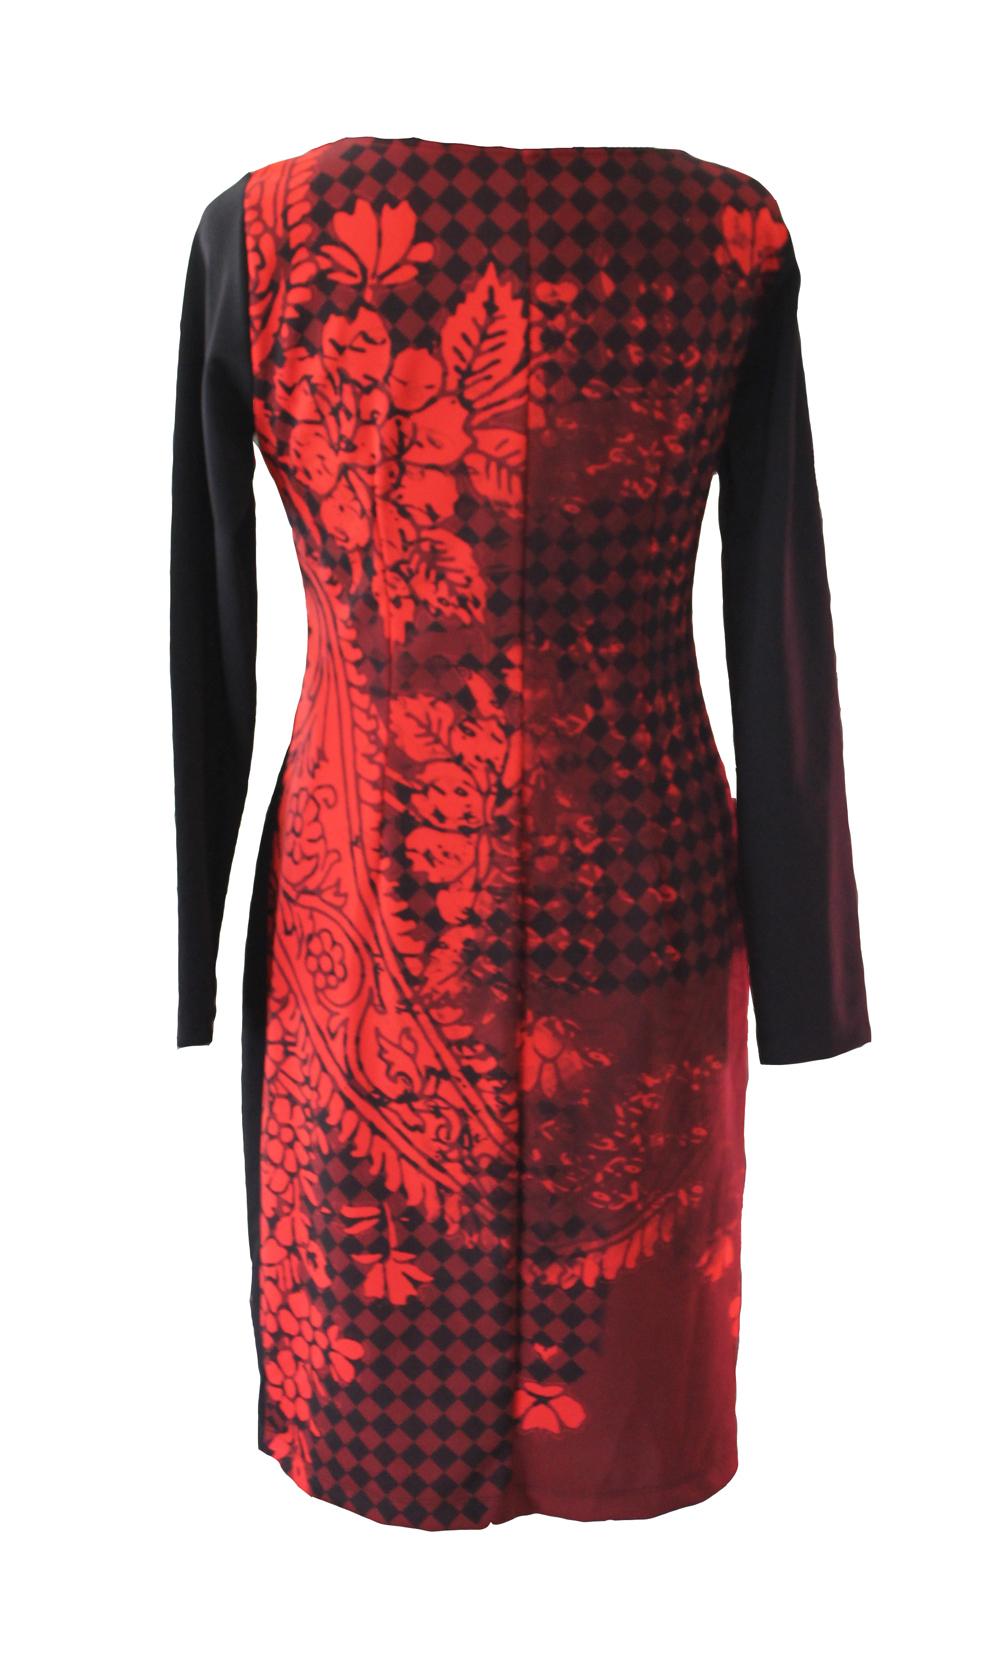 Eroke Italy: Zone Hot Dress (Almost Gone!)